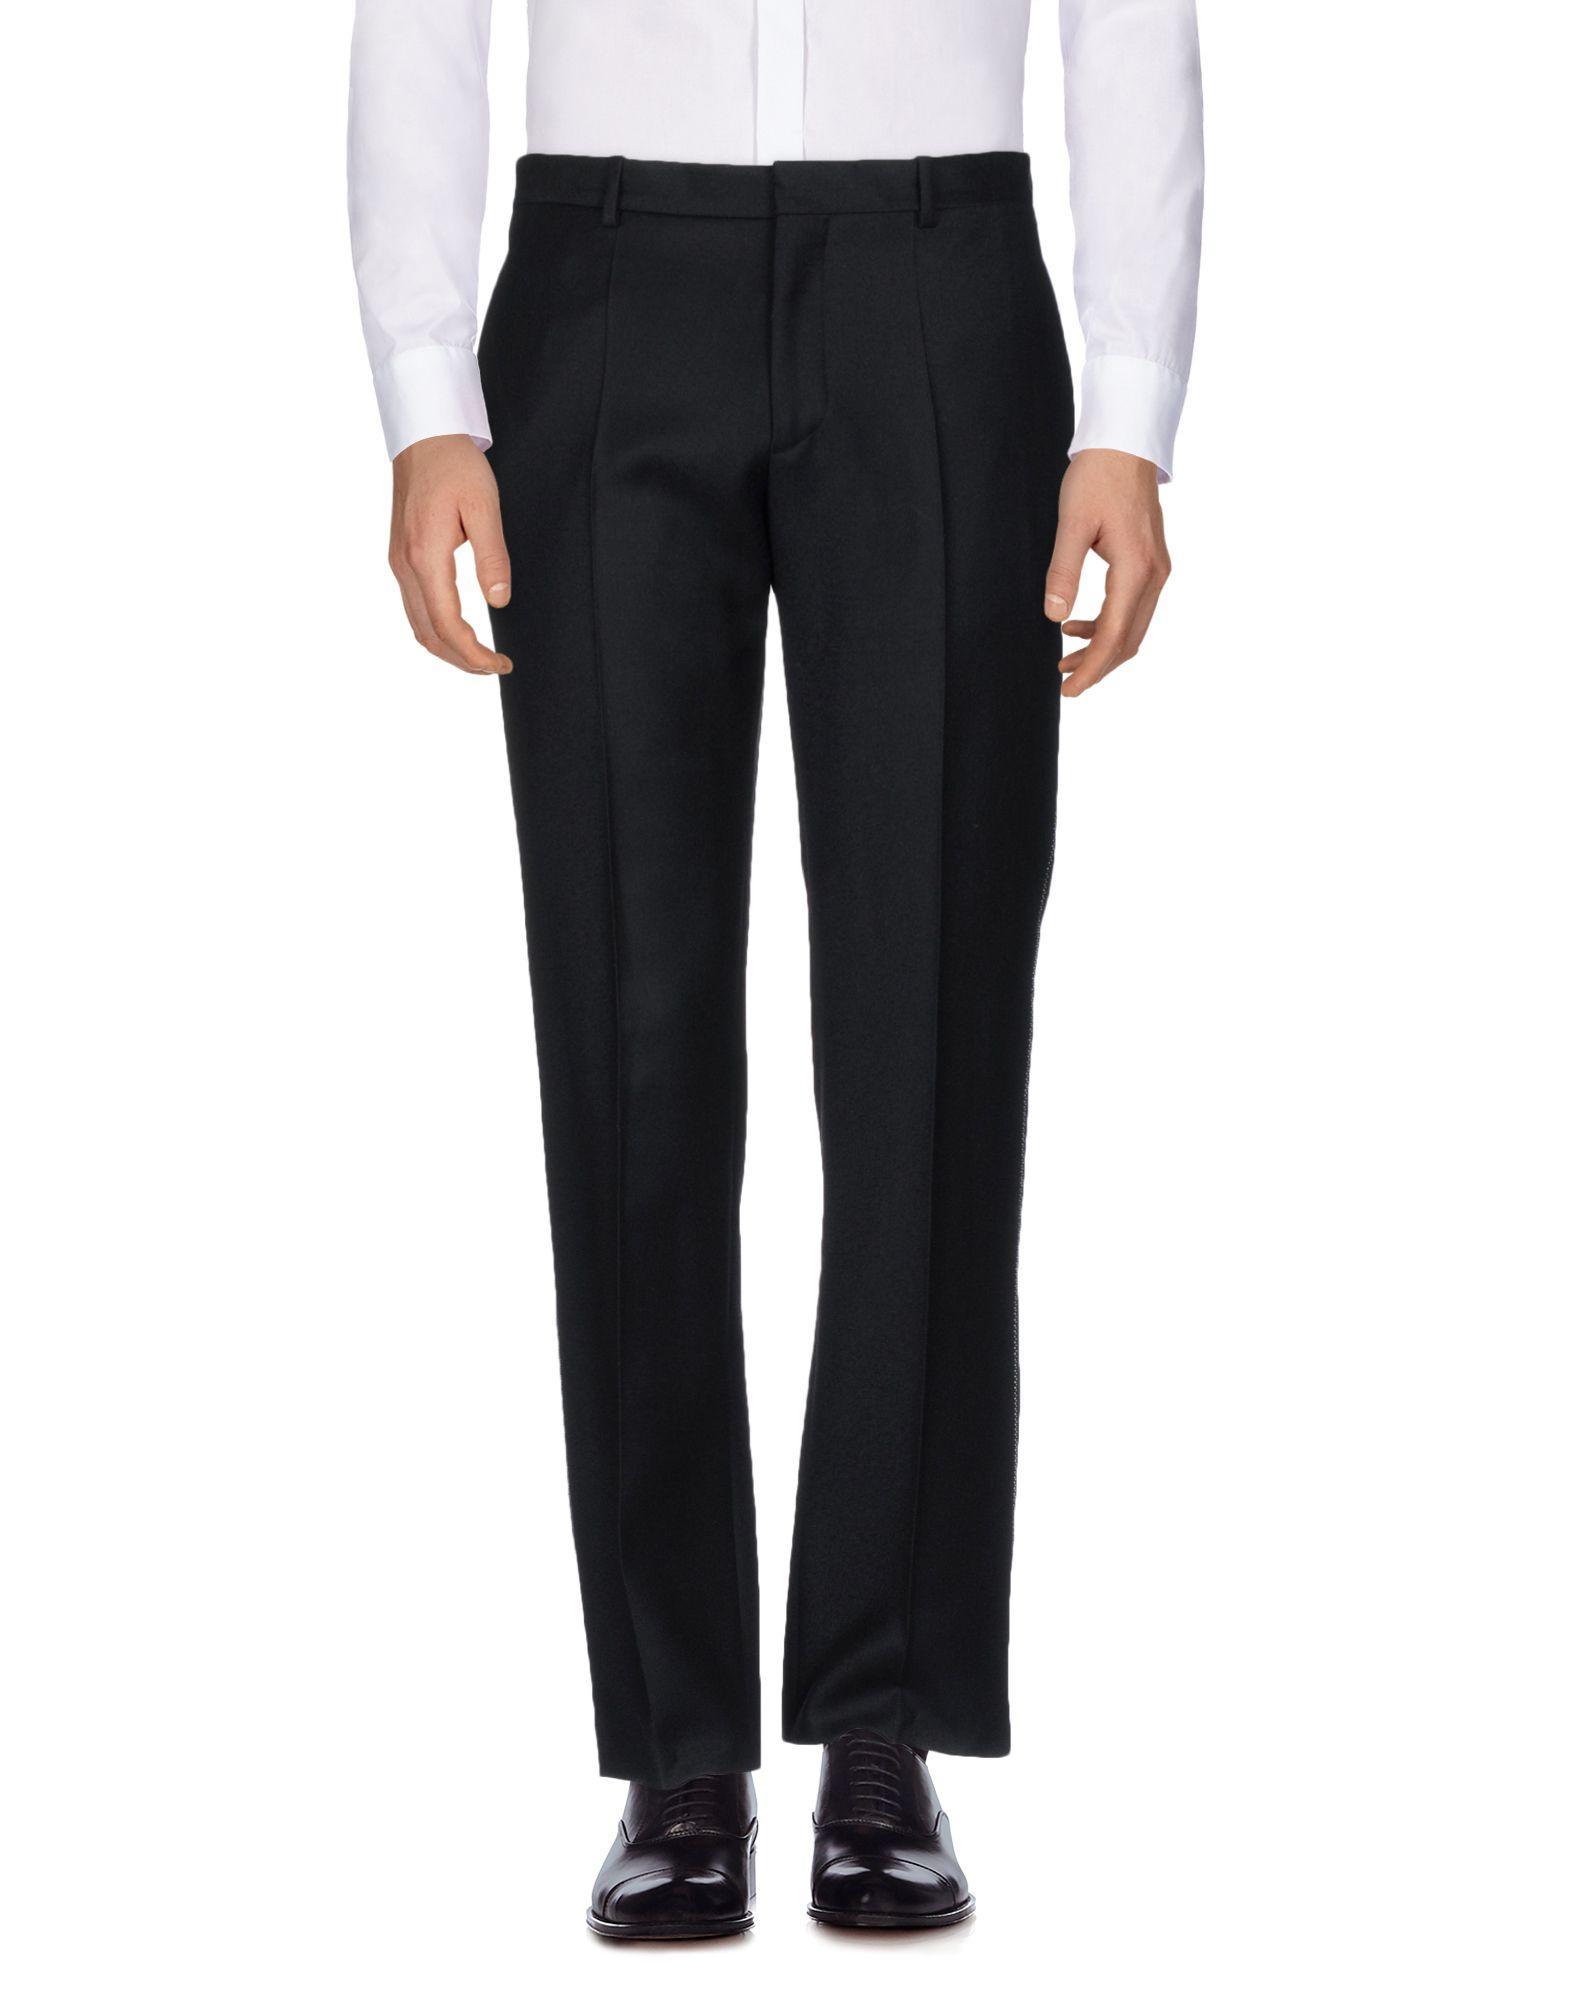 Maison Margiela Casual Pants In Black